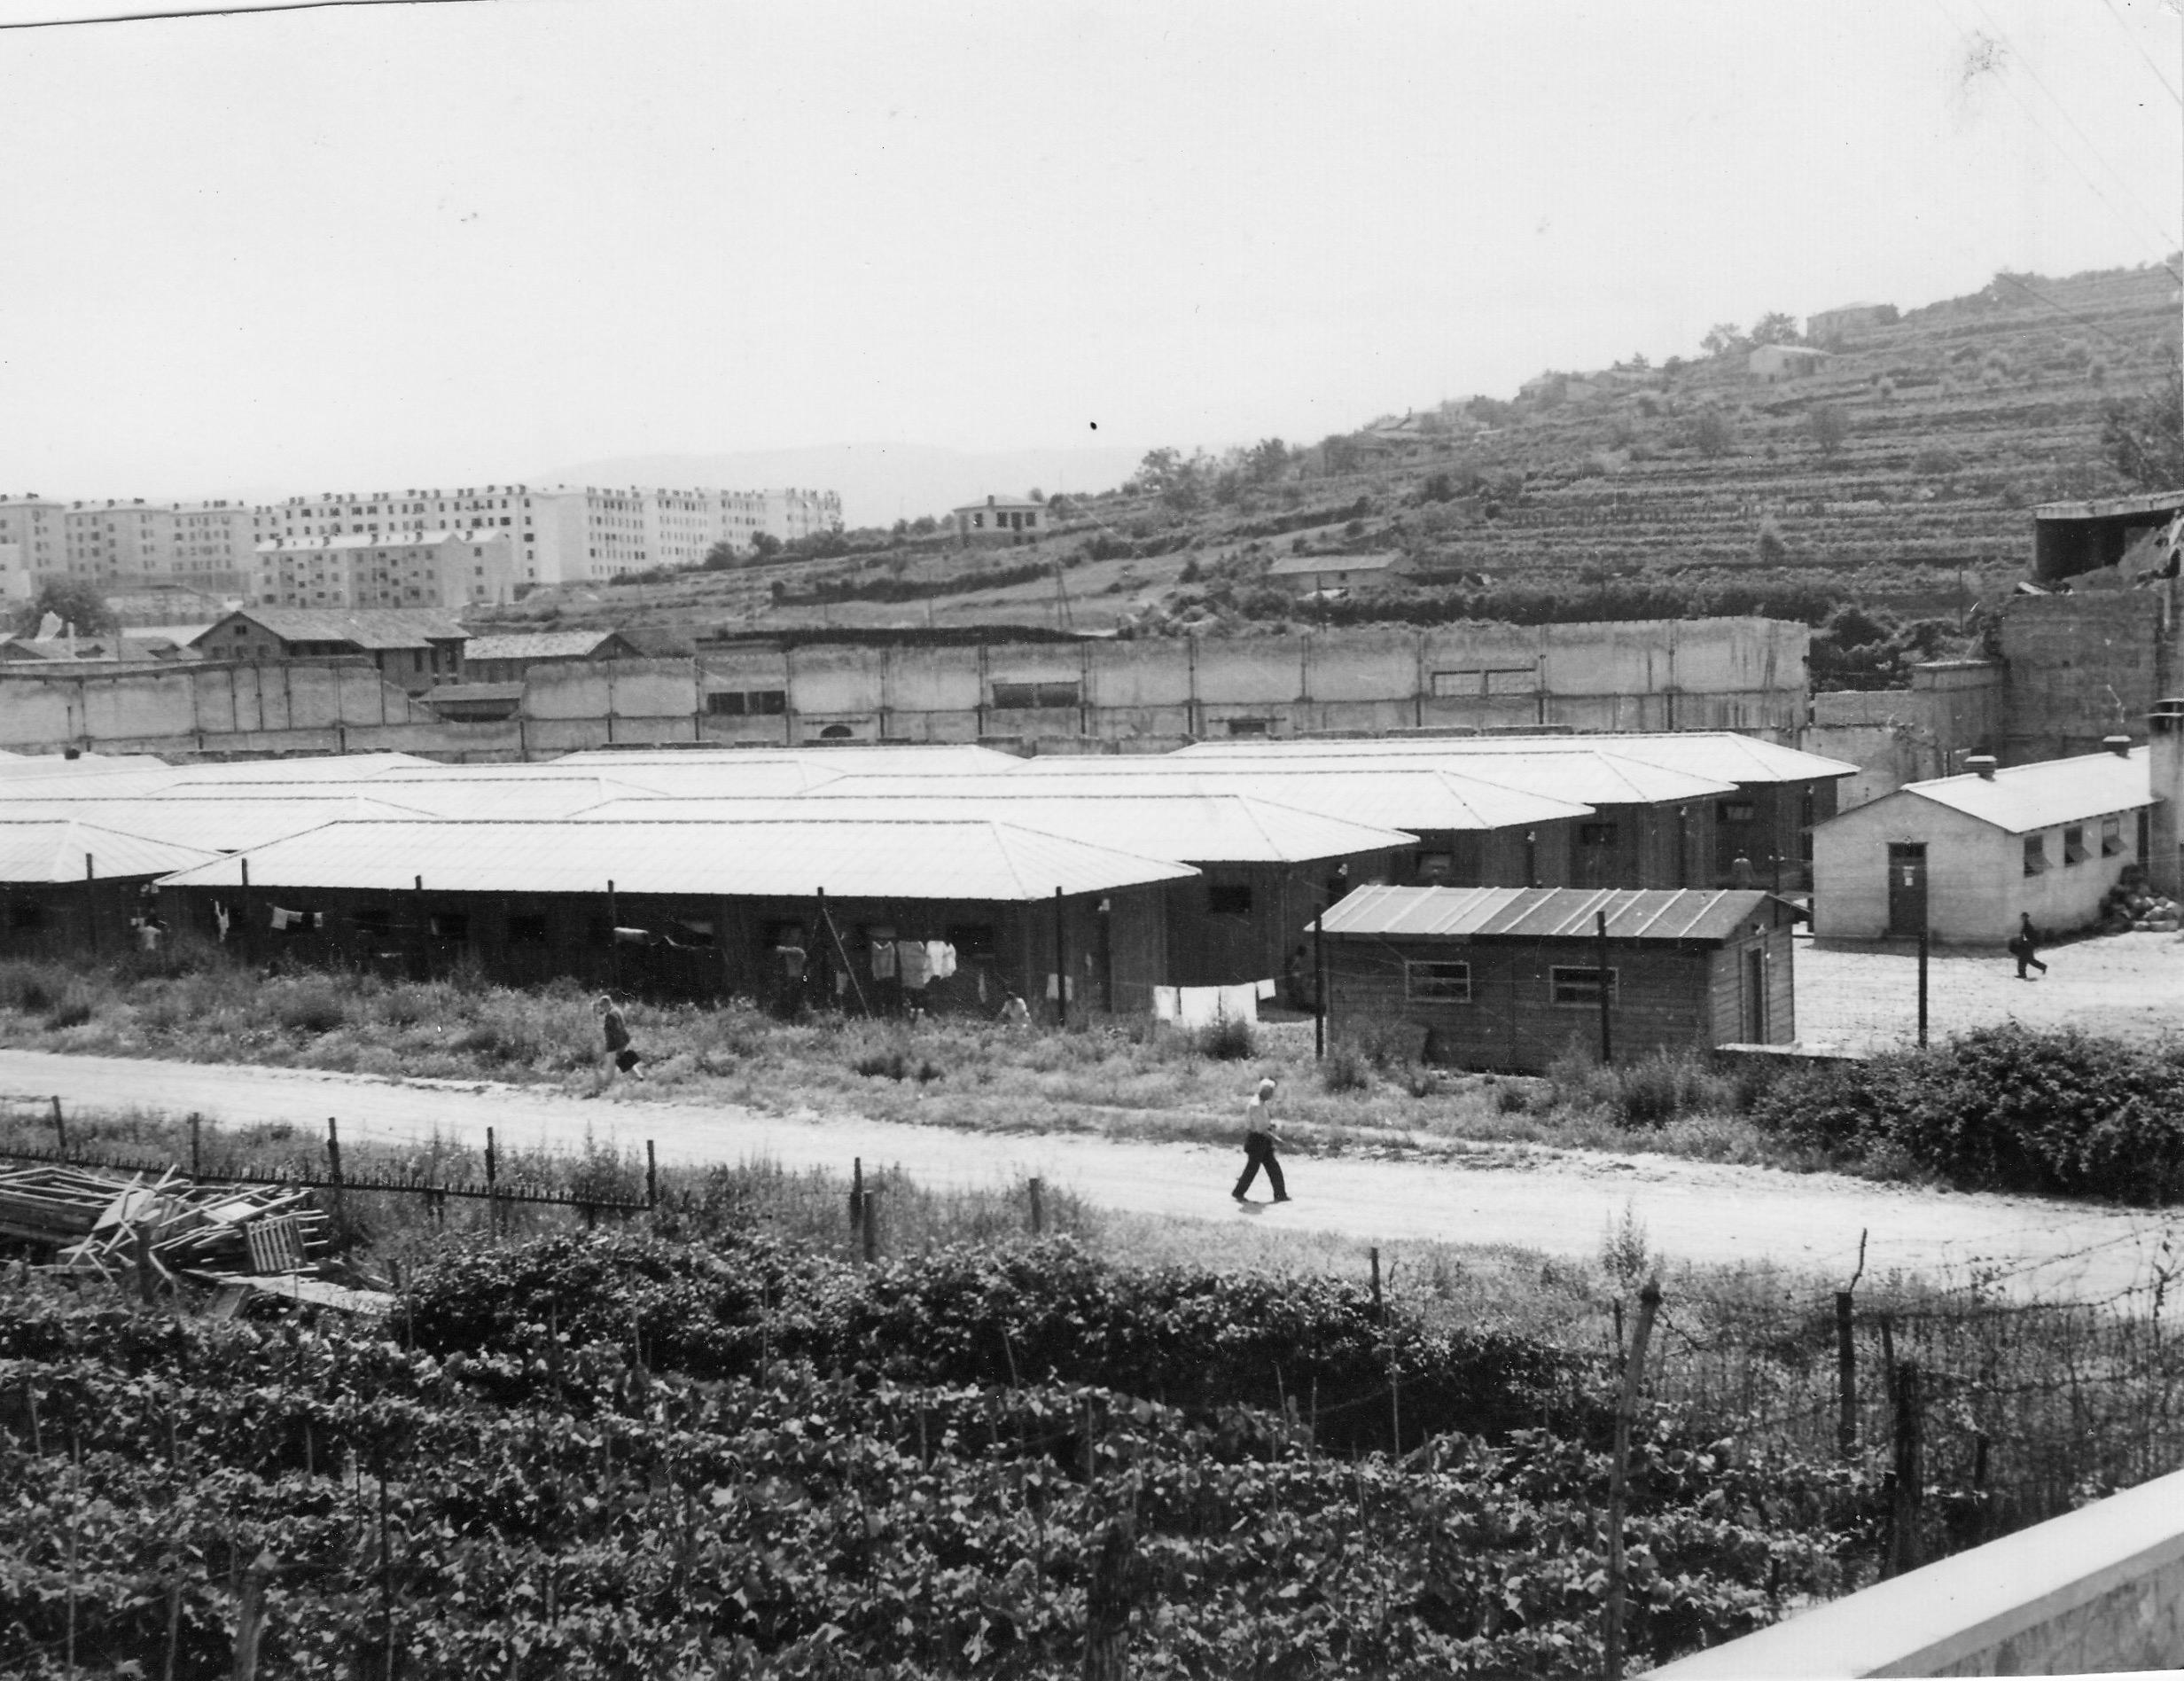 San Sabba Annex 30 new barracks 1950